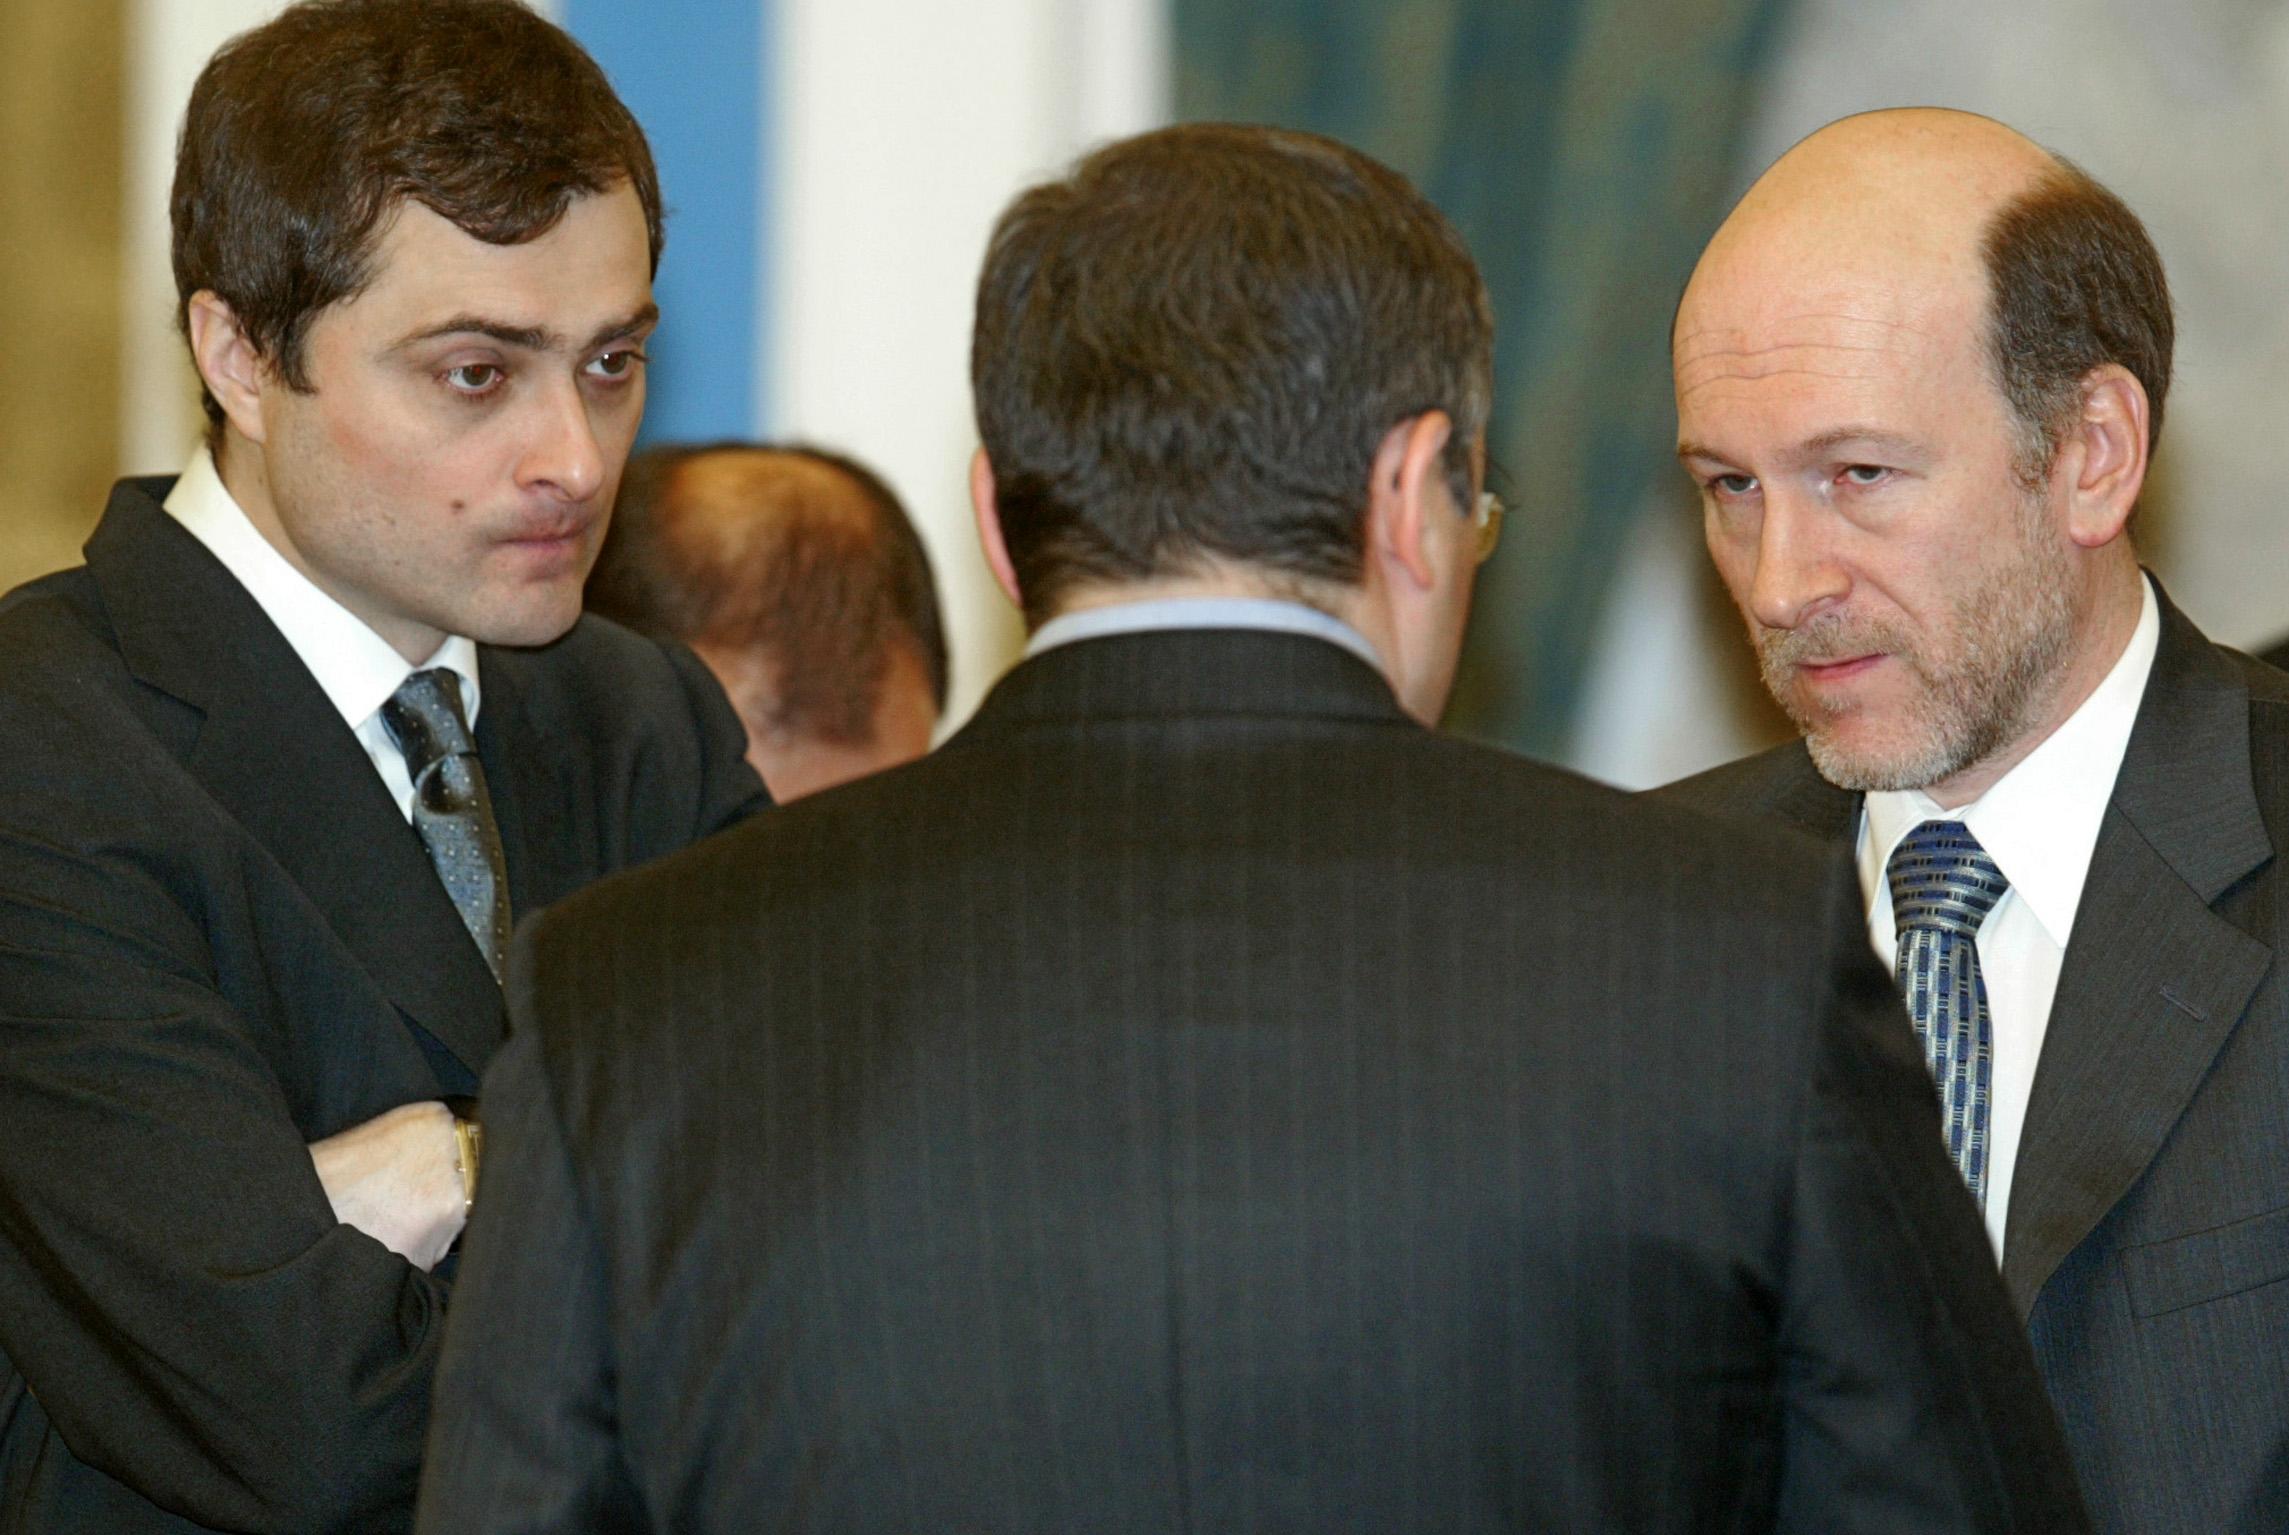 De gauche à droite : Vladislav Sourkov, Mikhaïl Khodorkovski (de dos)